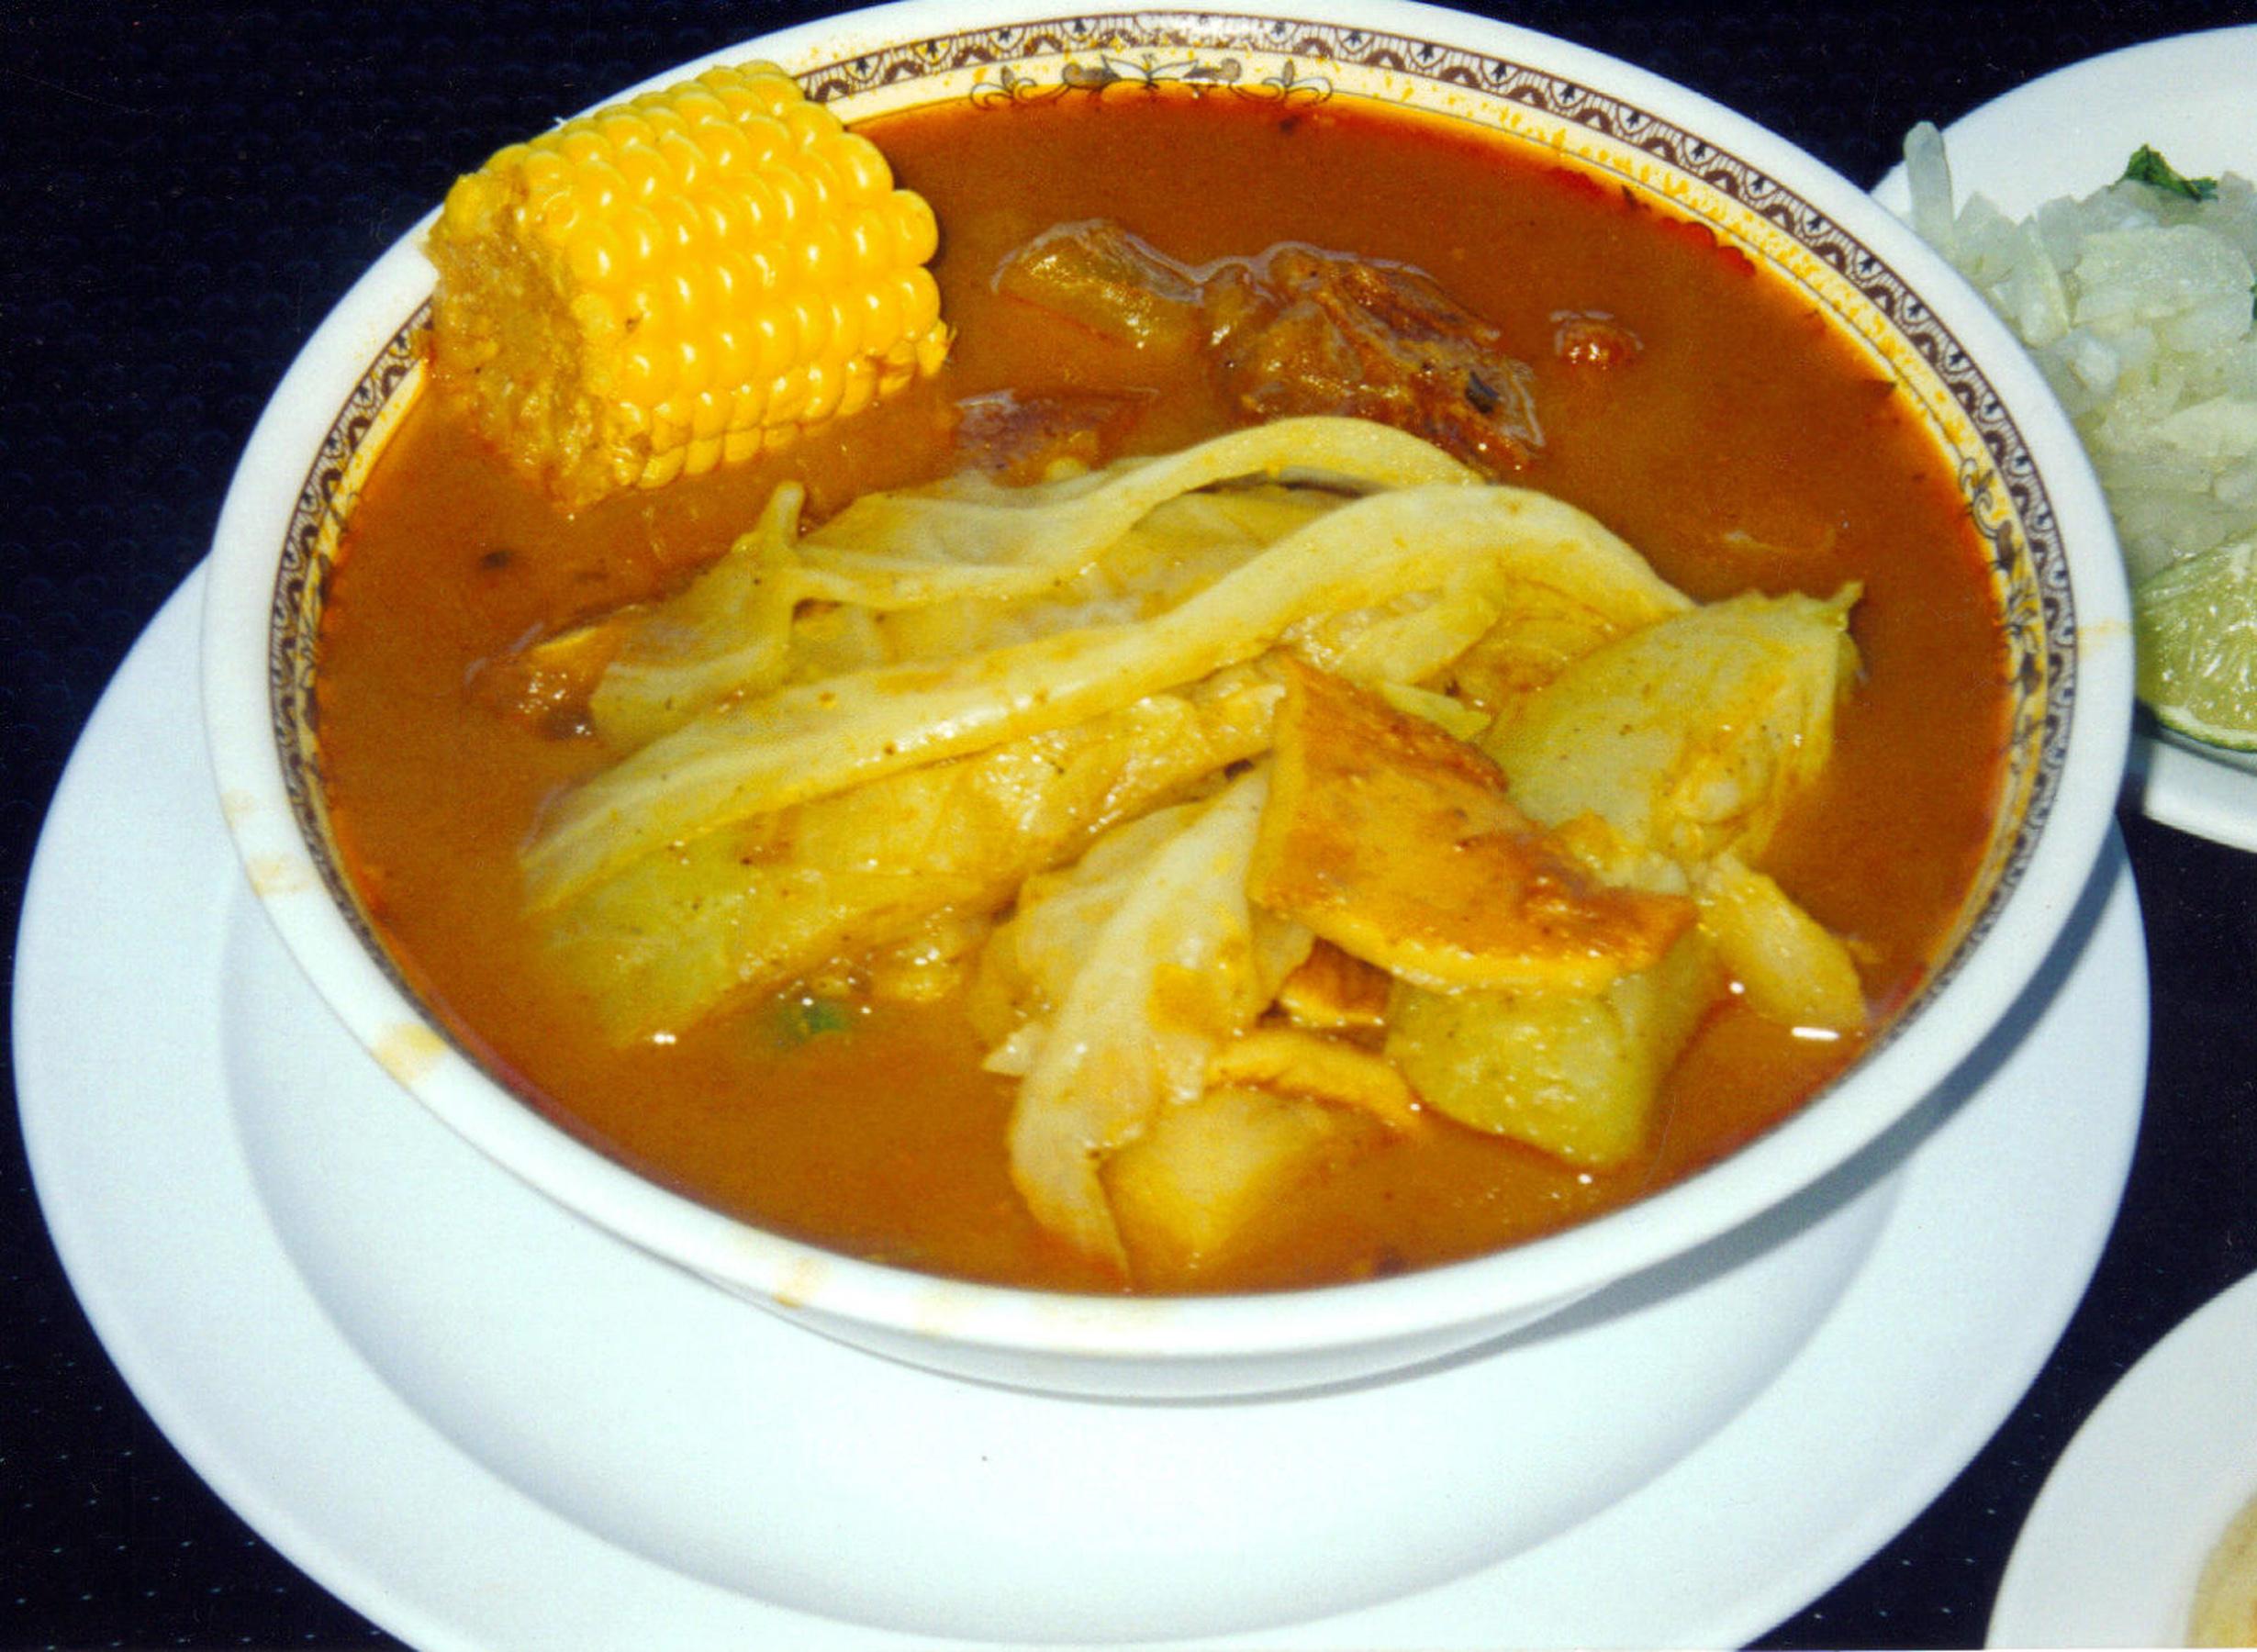 Sopa de Pata (Cow's Feet Soup), Panamanian Food, Panamanian cuisine, Traditional Panamanian Food, food in Panama, Panamanian dishes